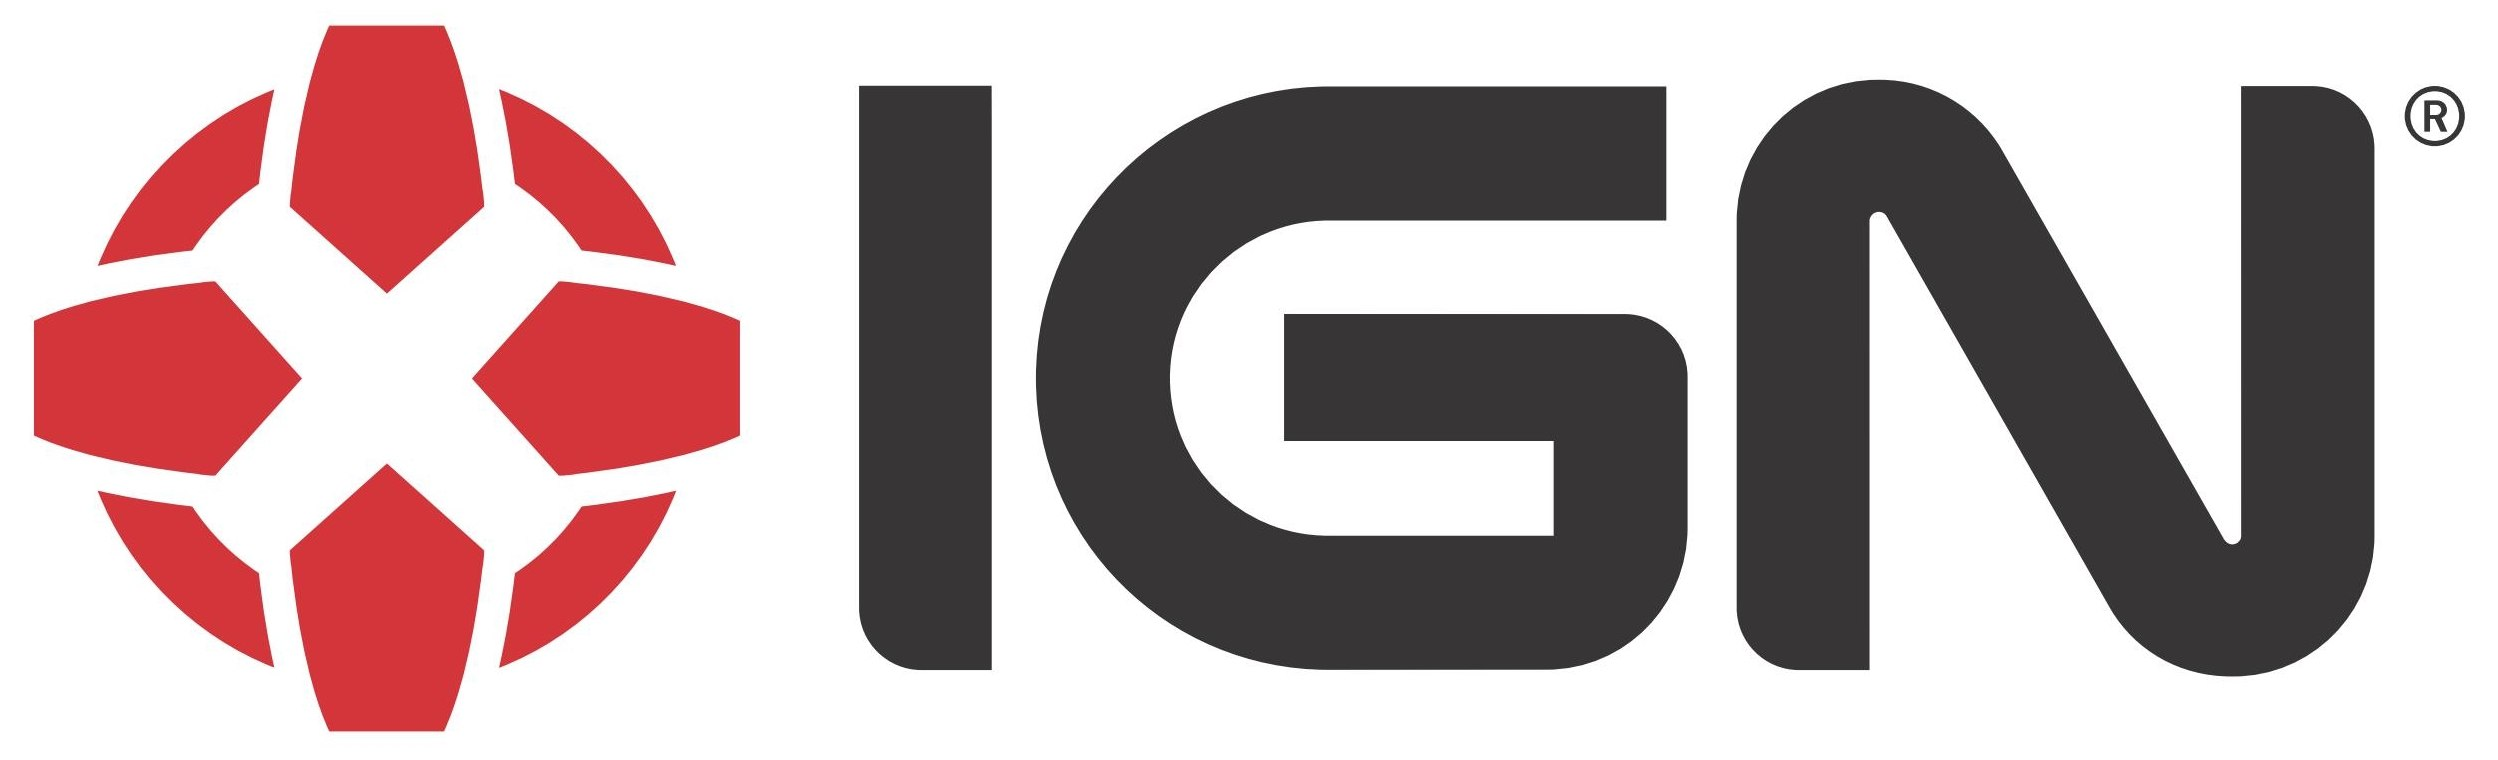 IGN-Imagine-Games-Network-Logo